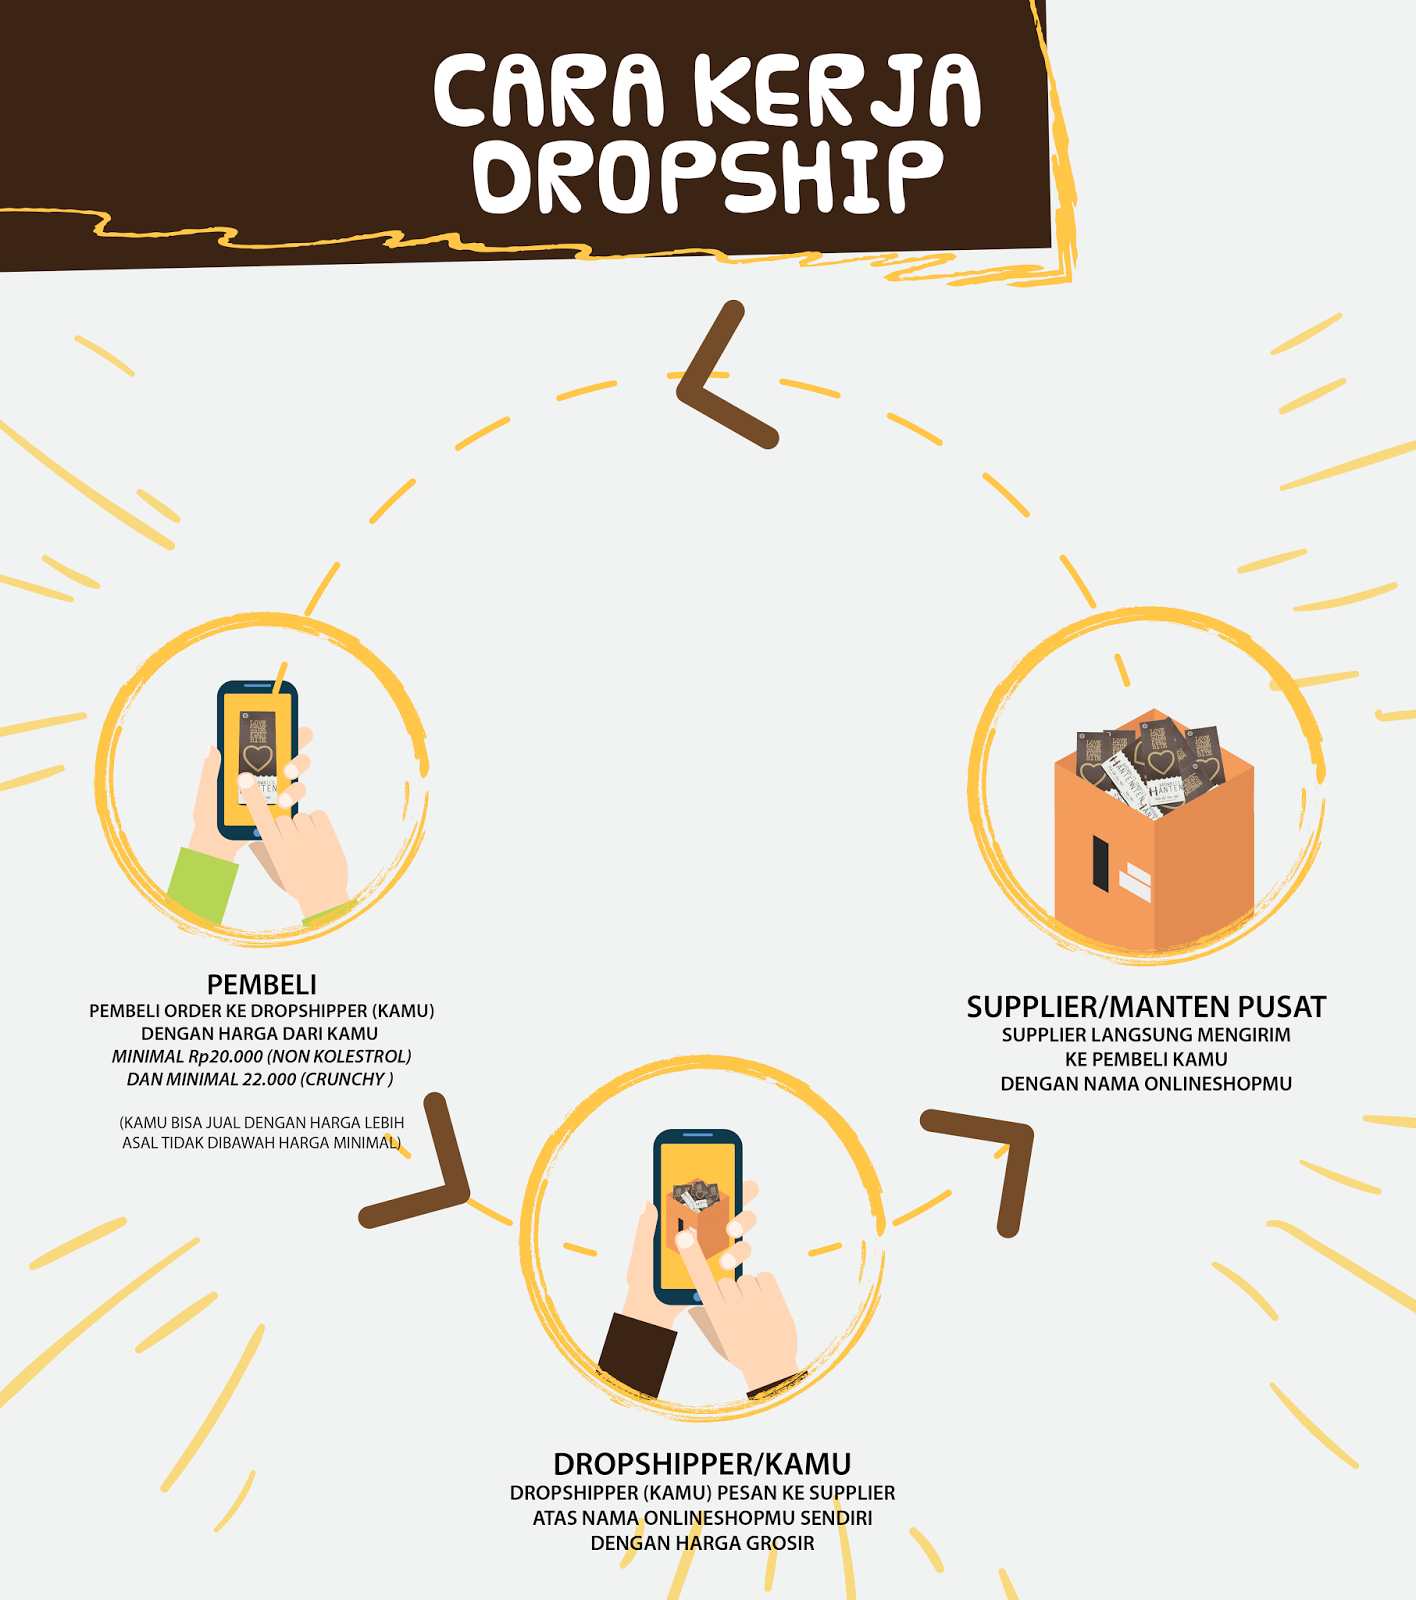 cara kerja dropship brownies manten